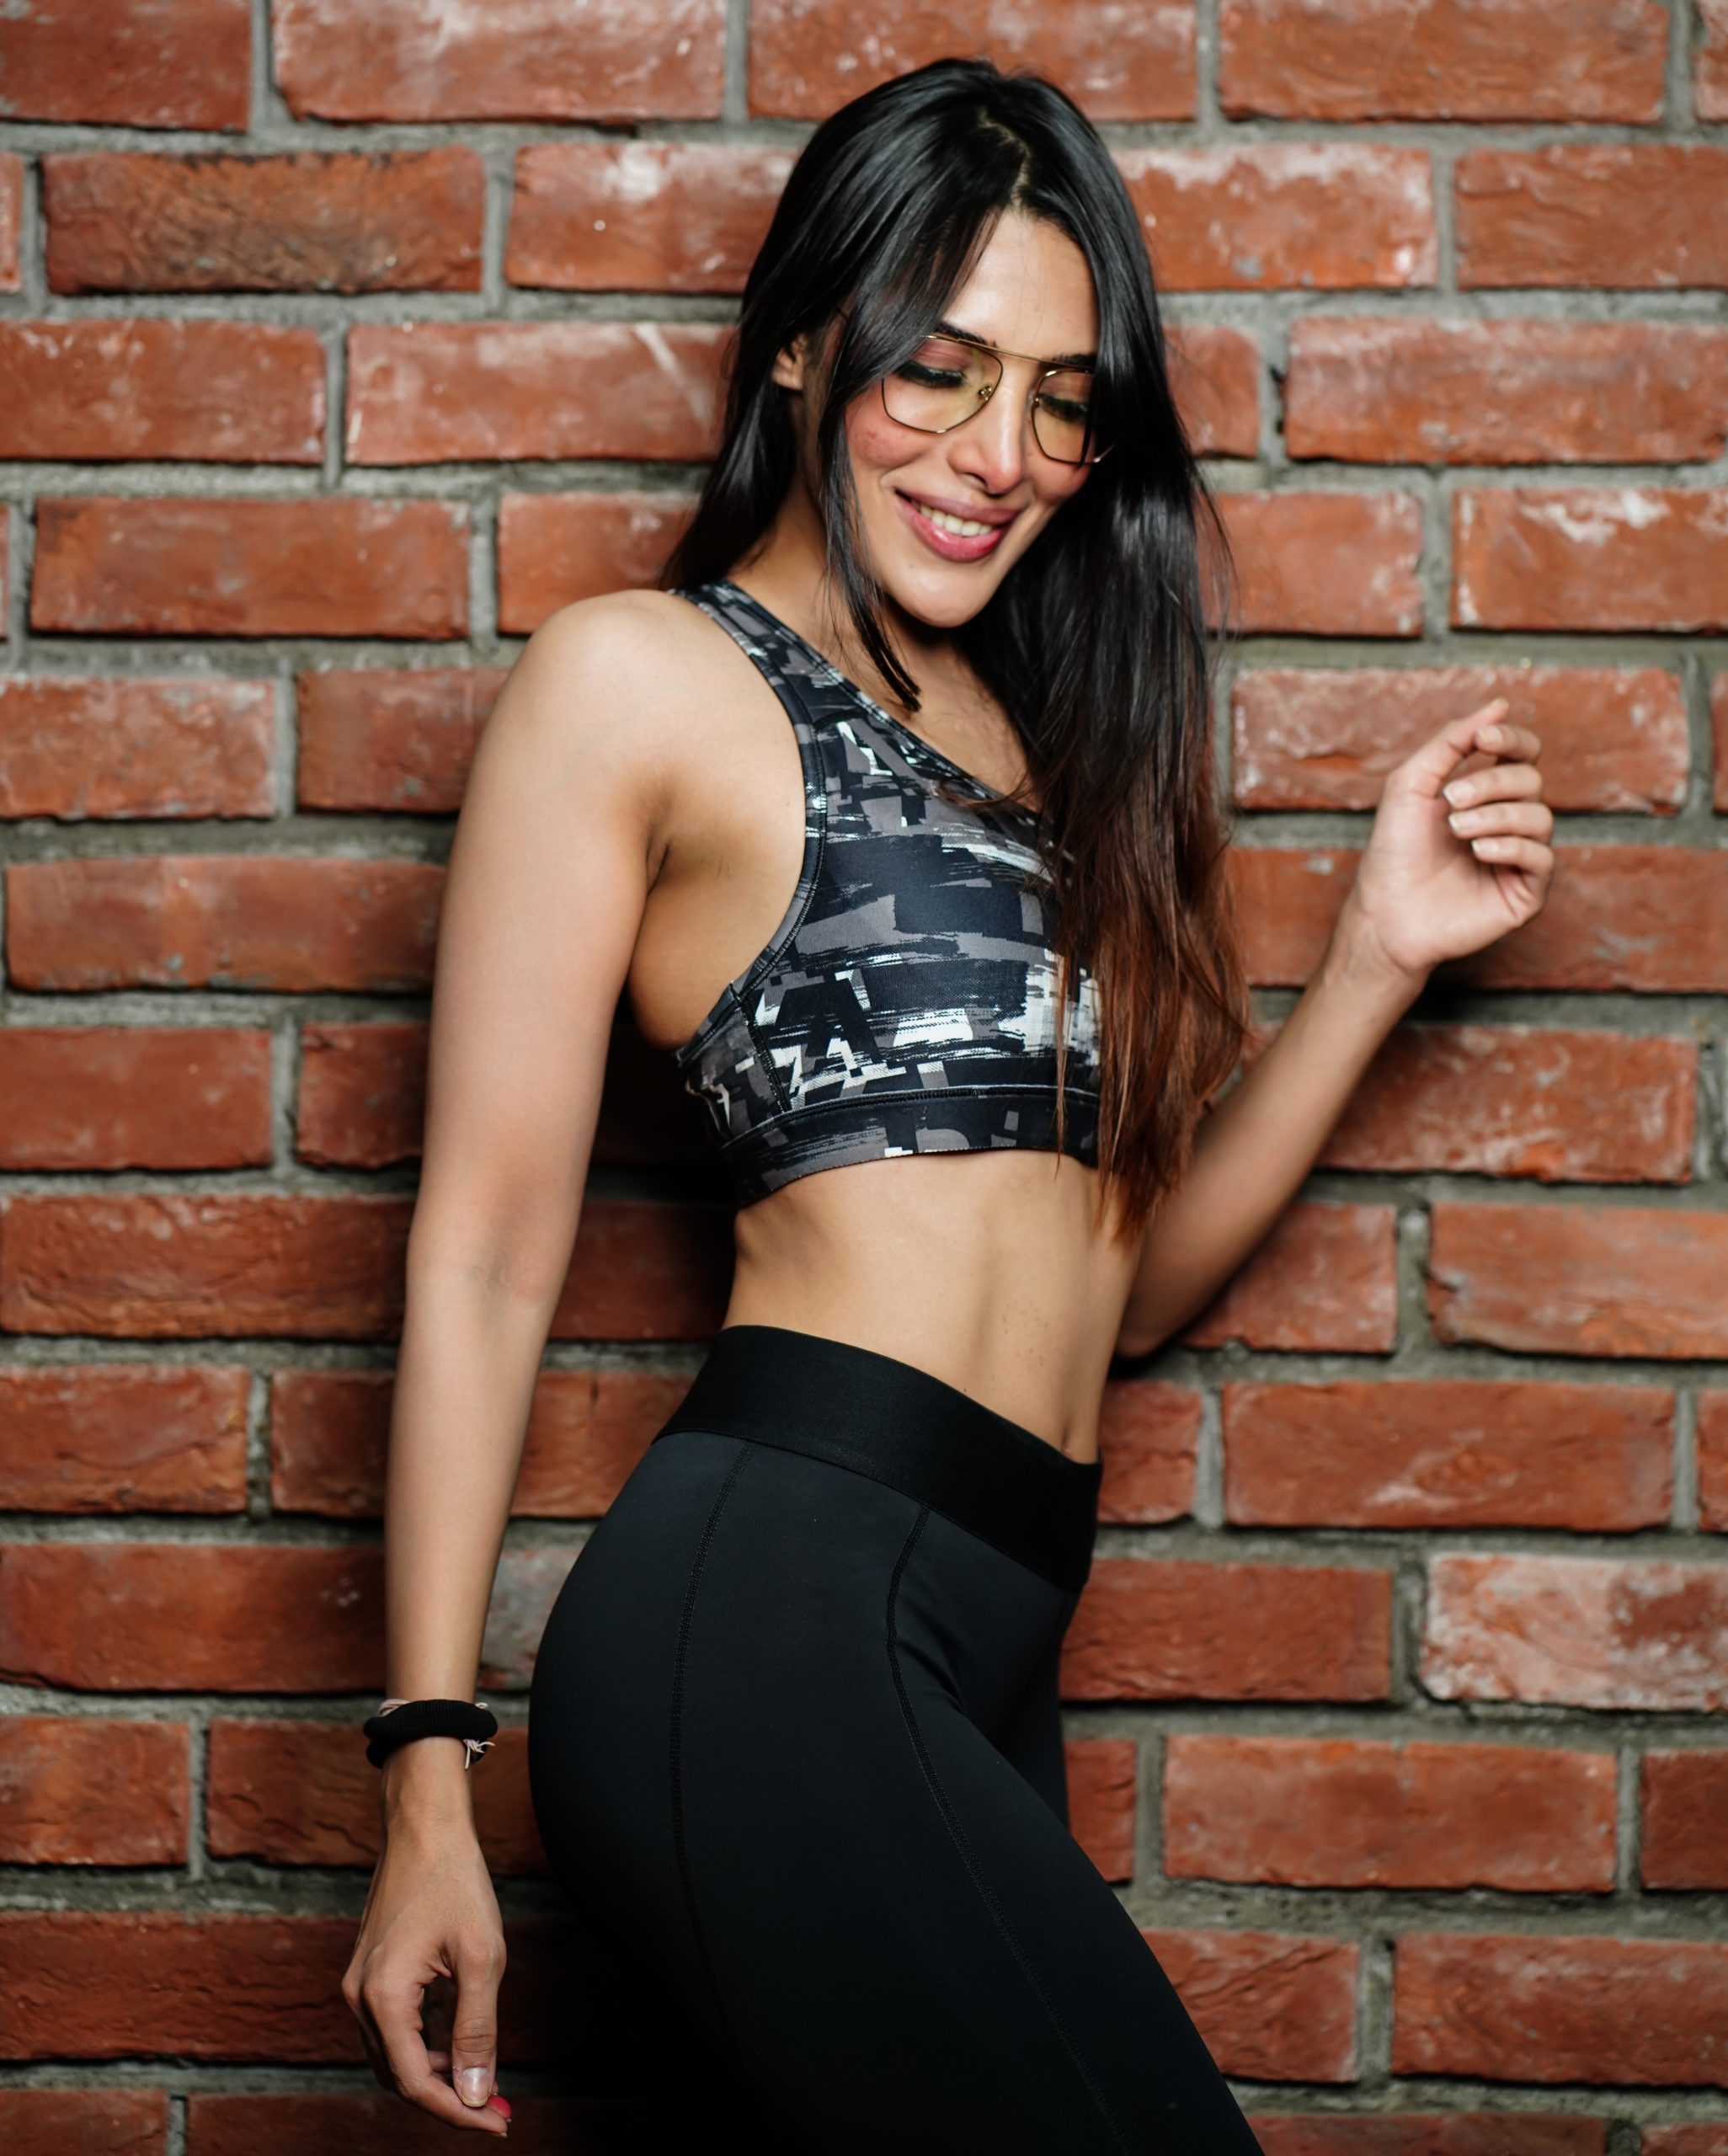 Happy female fitness model